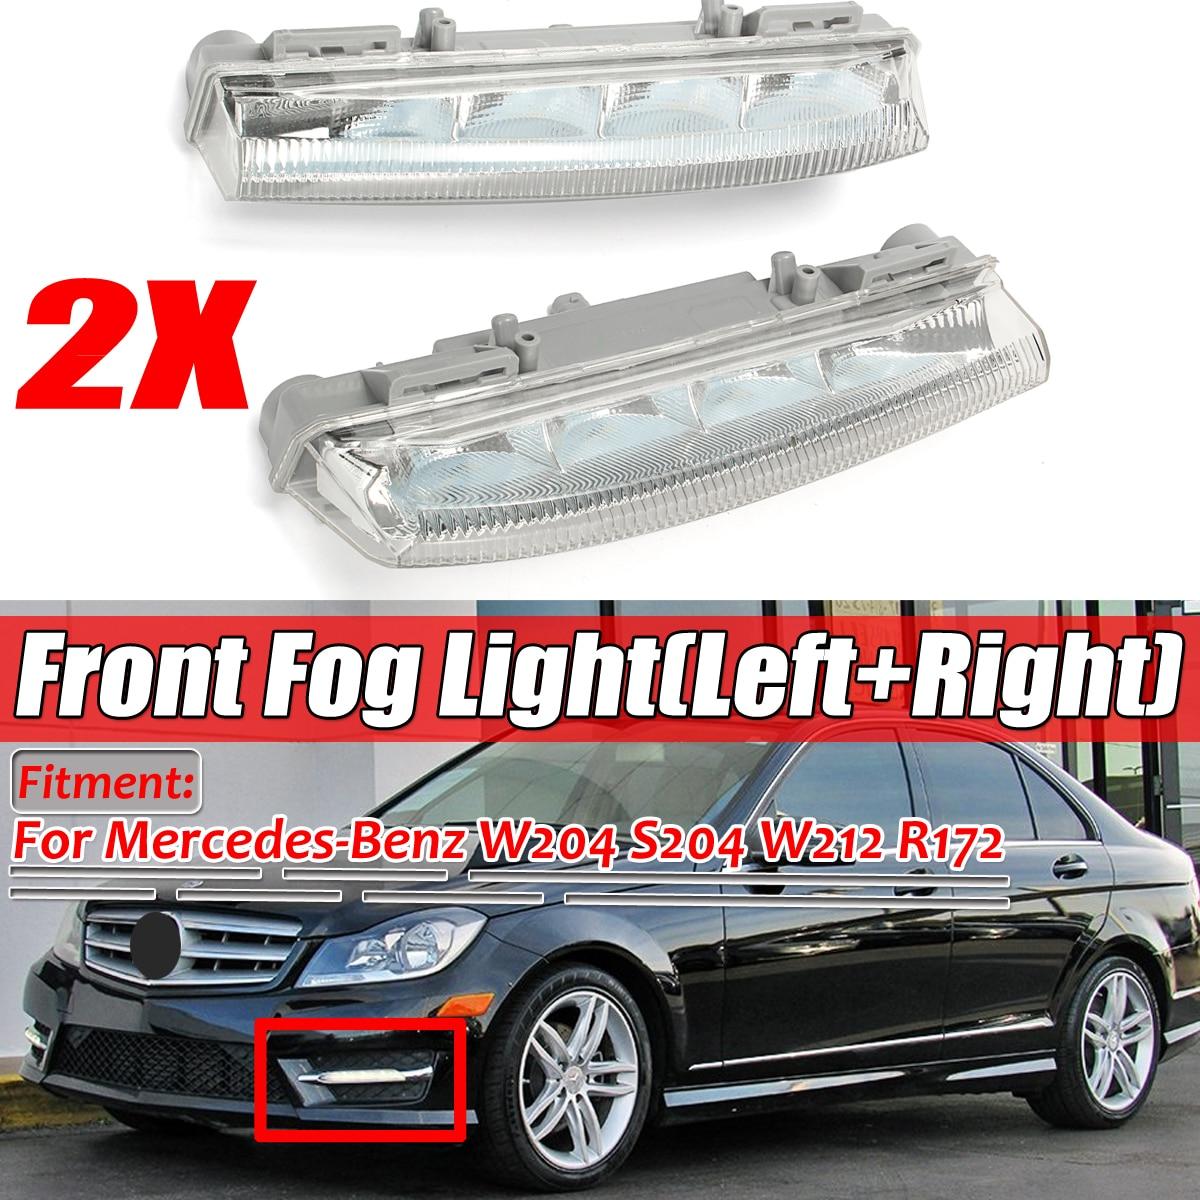 12V Daytime Running Light for W204//212//R172 2049068900 Replace on Vehicle Left